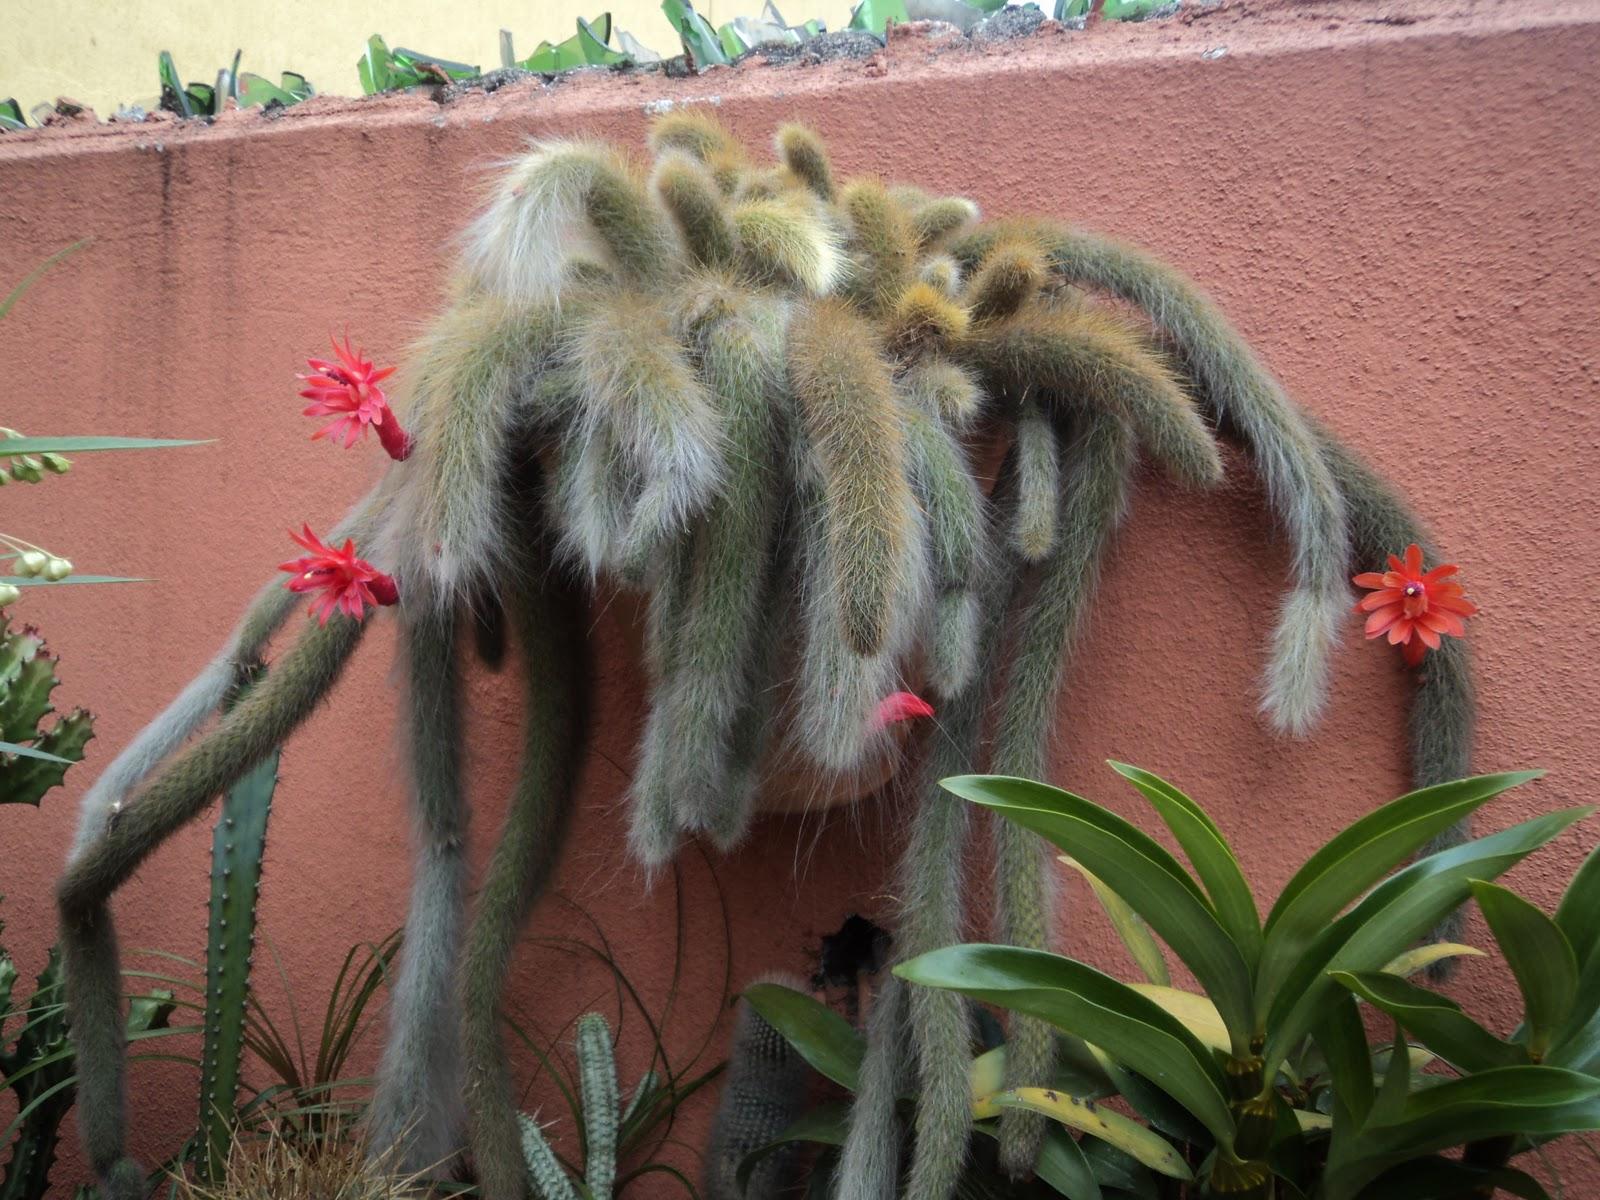 69c3e9e8b Todo dia é dia de jardinar  Cacto rabo de macaco e dá-lhe flores